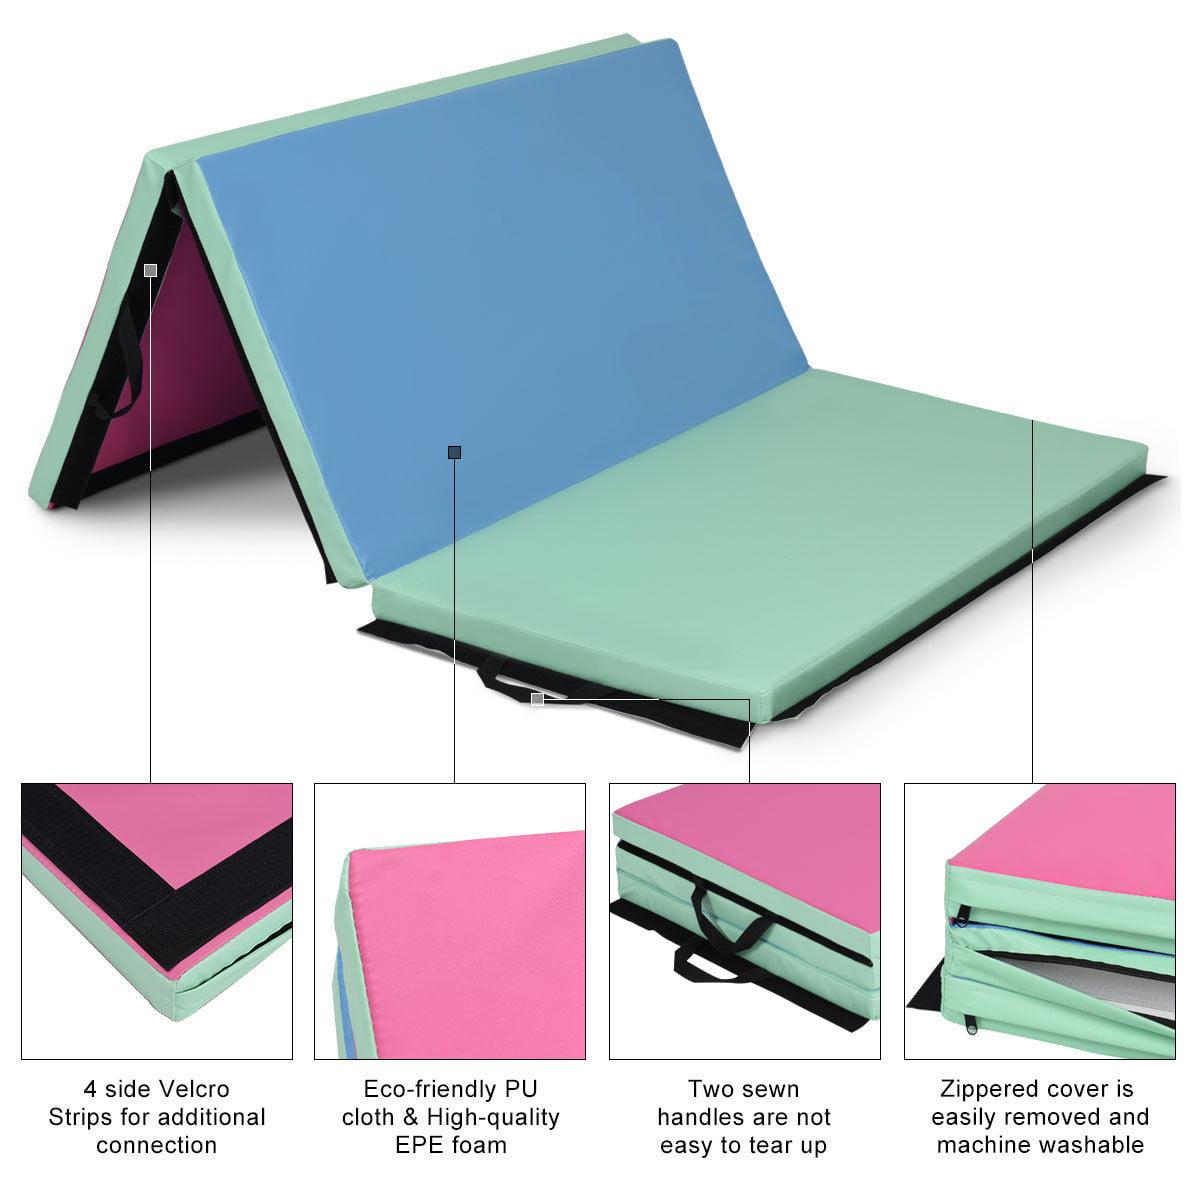 Gymax 4'x6'x2'' Portable Tri-fold PU Gymnastic Mat Exercise Aerobics Gym Fitness - image 4 of 8